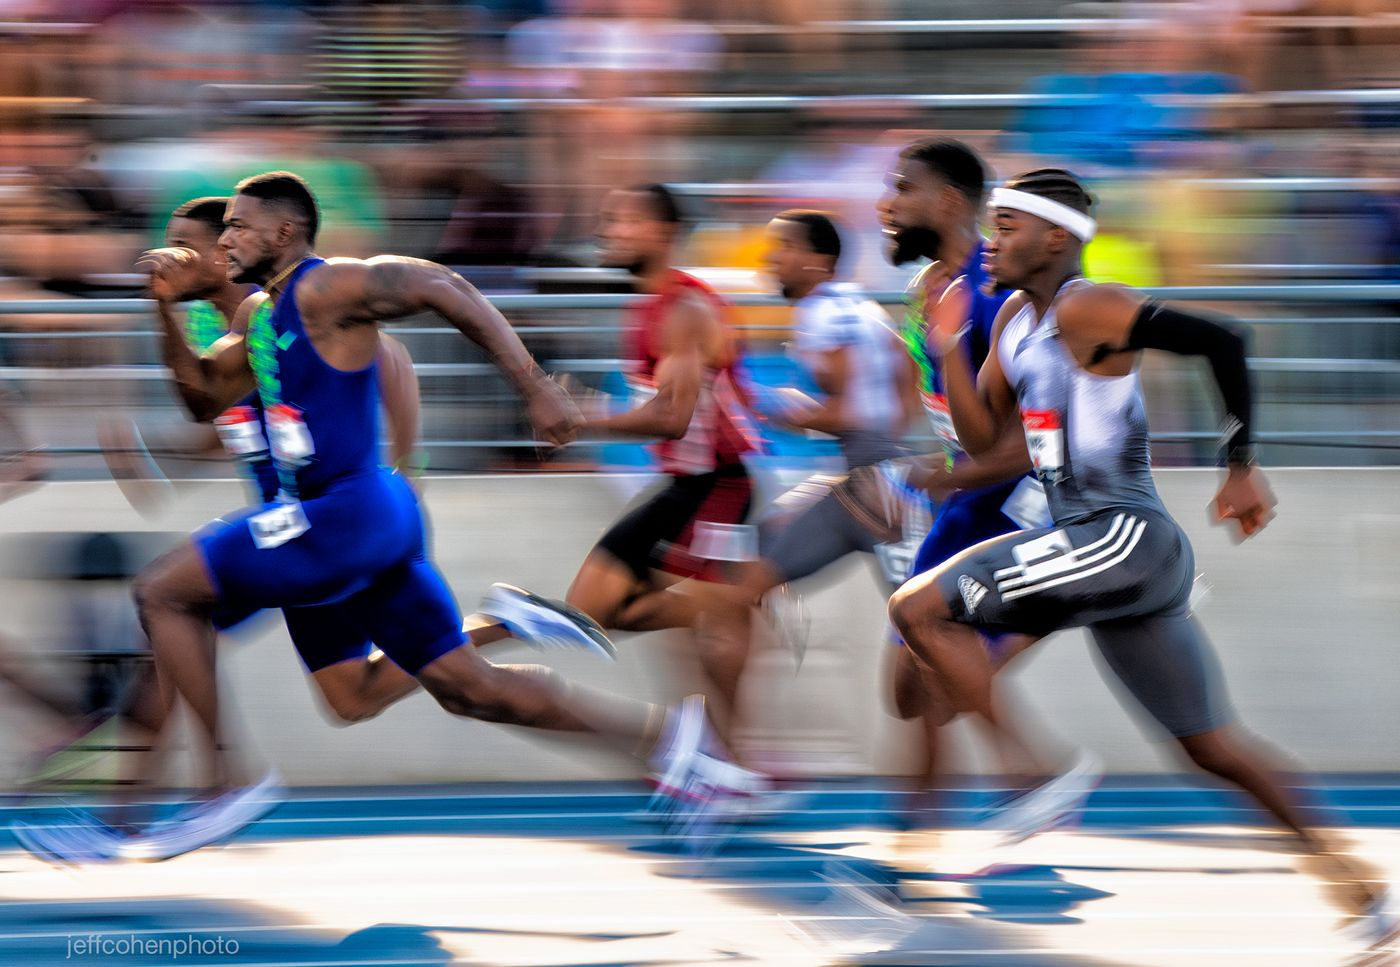 2019-USATF-Outdoor-Champs-day-2-gatlin-100m-blur--1388---jeff-cohen-photo--web.jpg